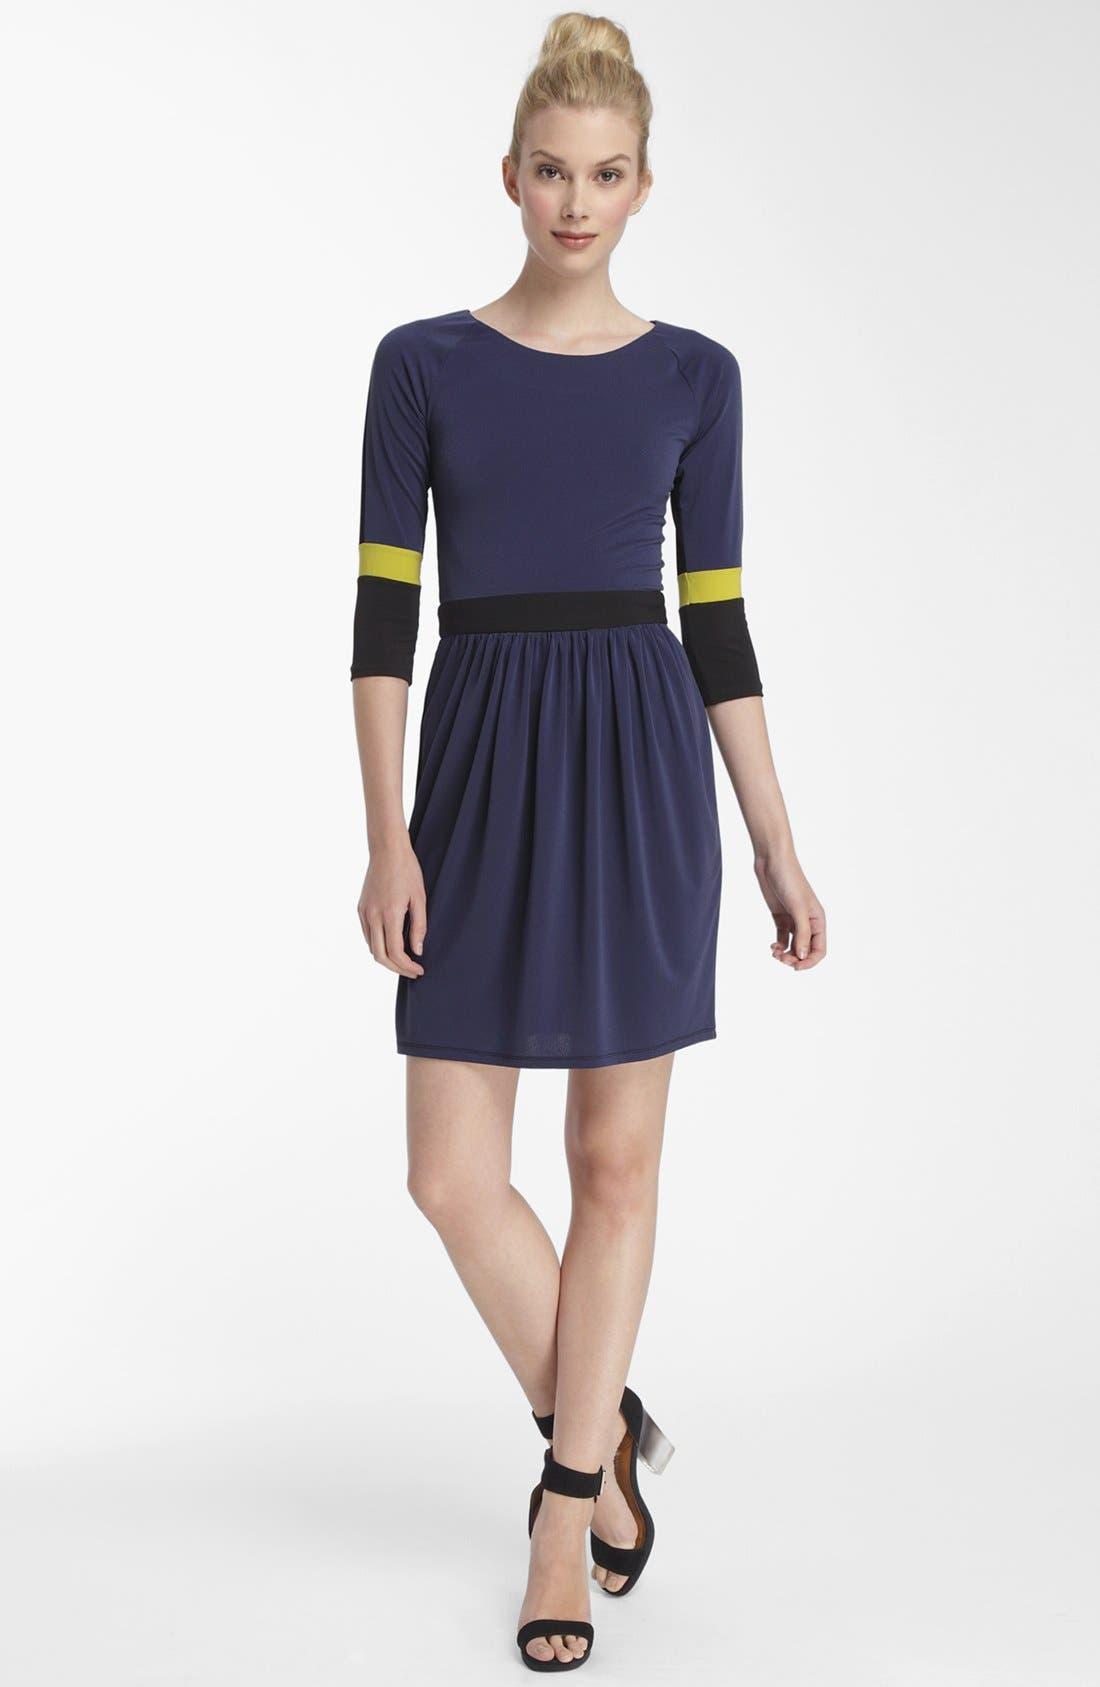 Main Image - Catherine Catherine Malandrino 'Nala' Knit Dress